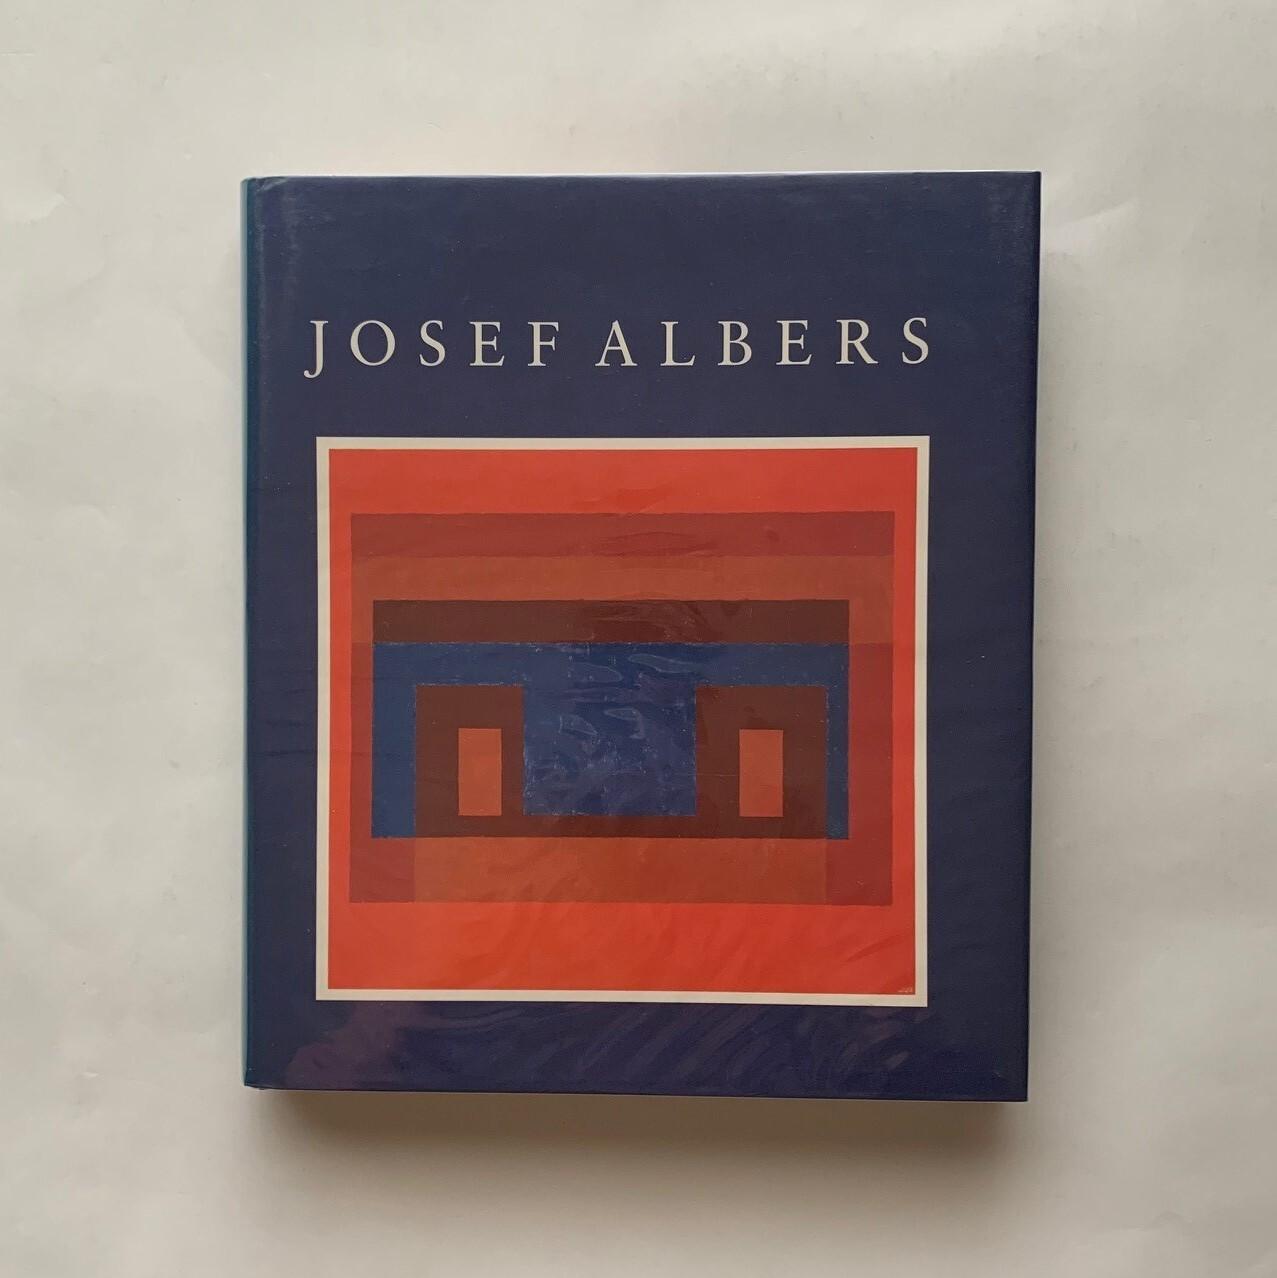 Josef Albers: A Retrospective /  Josef Albers  /  ジョセフ・アルバース